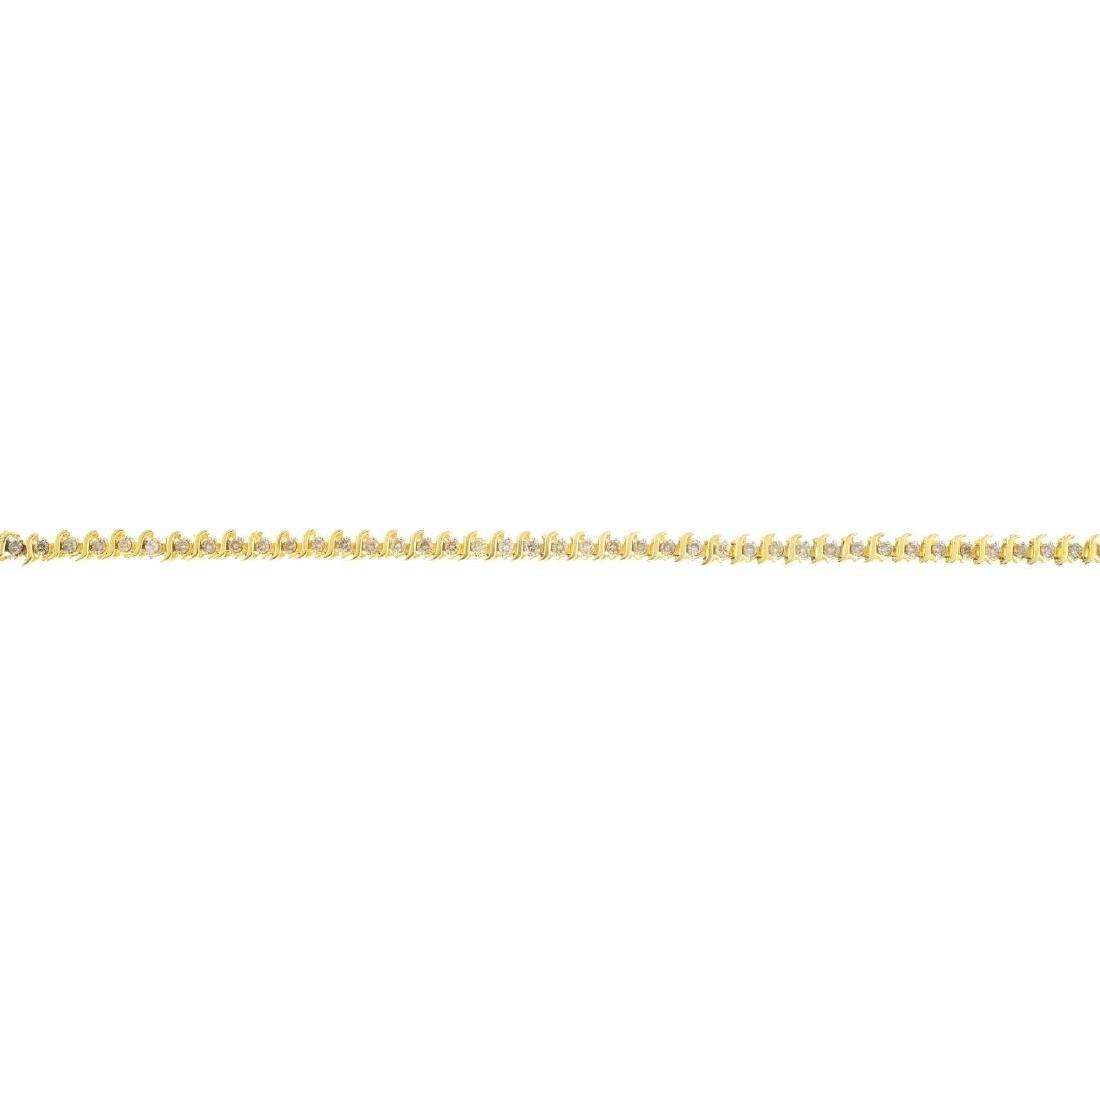 A 9ct gold diamond bracelet. Designed as a